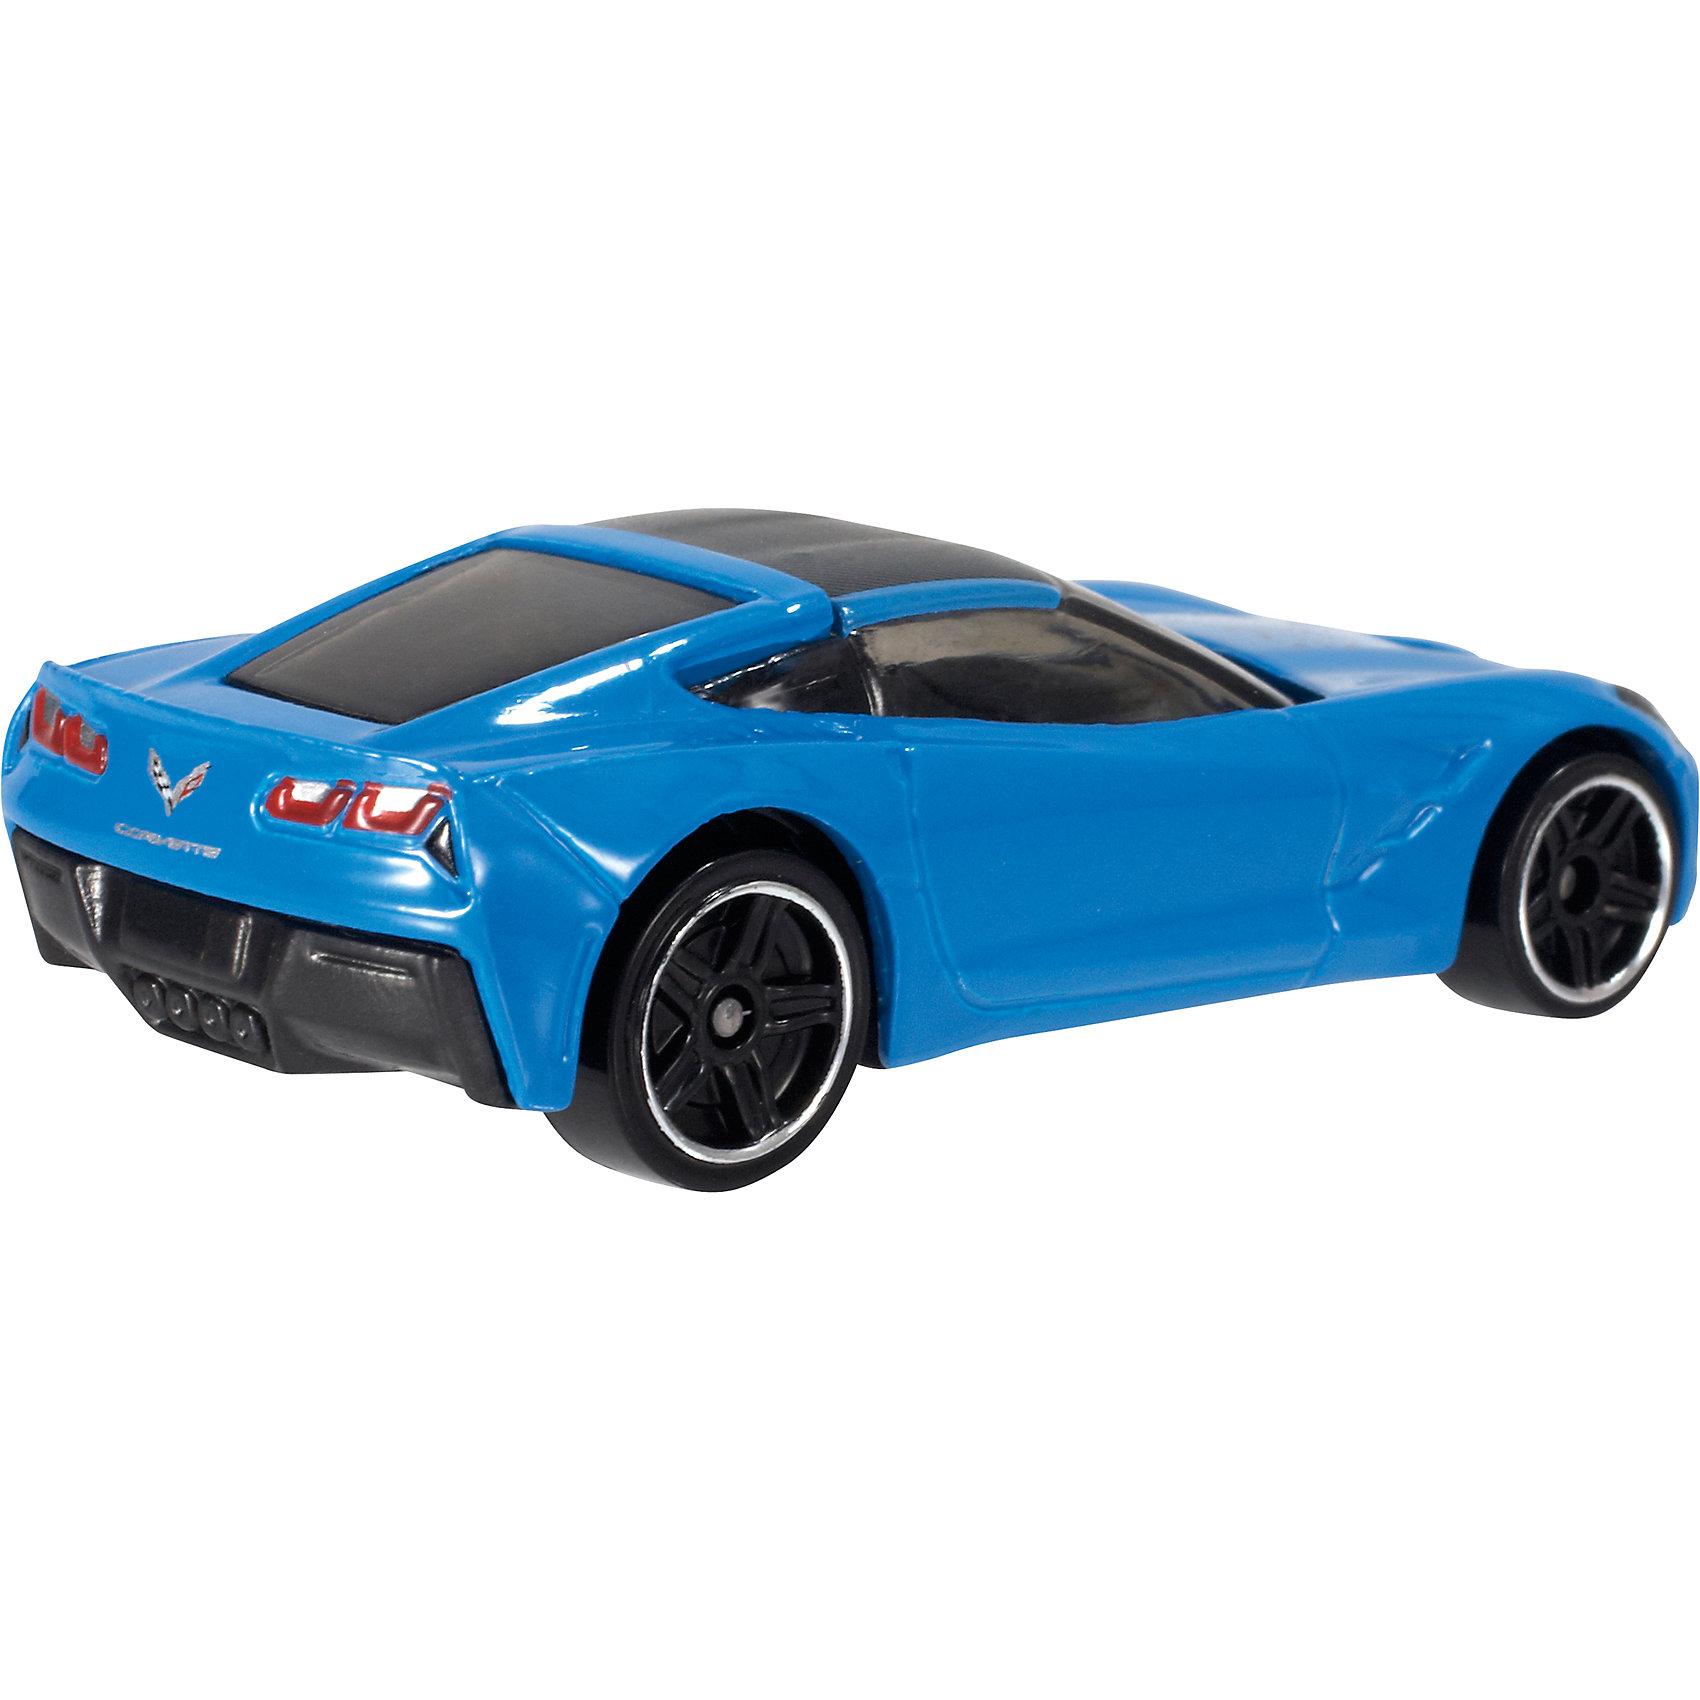 Базовая машинка Hot Wheels, 2014 Corvette StingrayМашинки<br><br><br>Ширина мм: 110<br>Глубина мм: 45<br>Высота мм: 110<br>Вес г: 30<br>Возраст от месяцев: 36<br>Возраст до месяцев: 96<br>Пол: Мужской<br>Возраст: Детский<br>SKU: 7111915